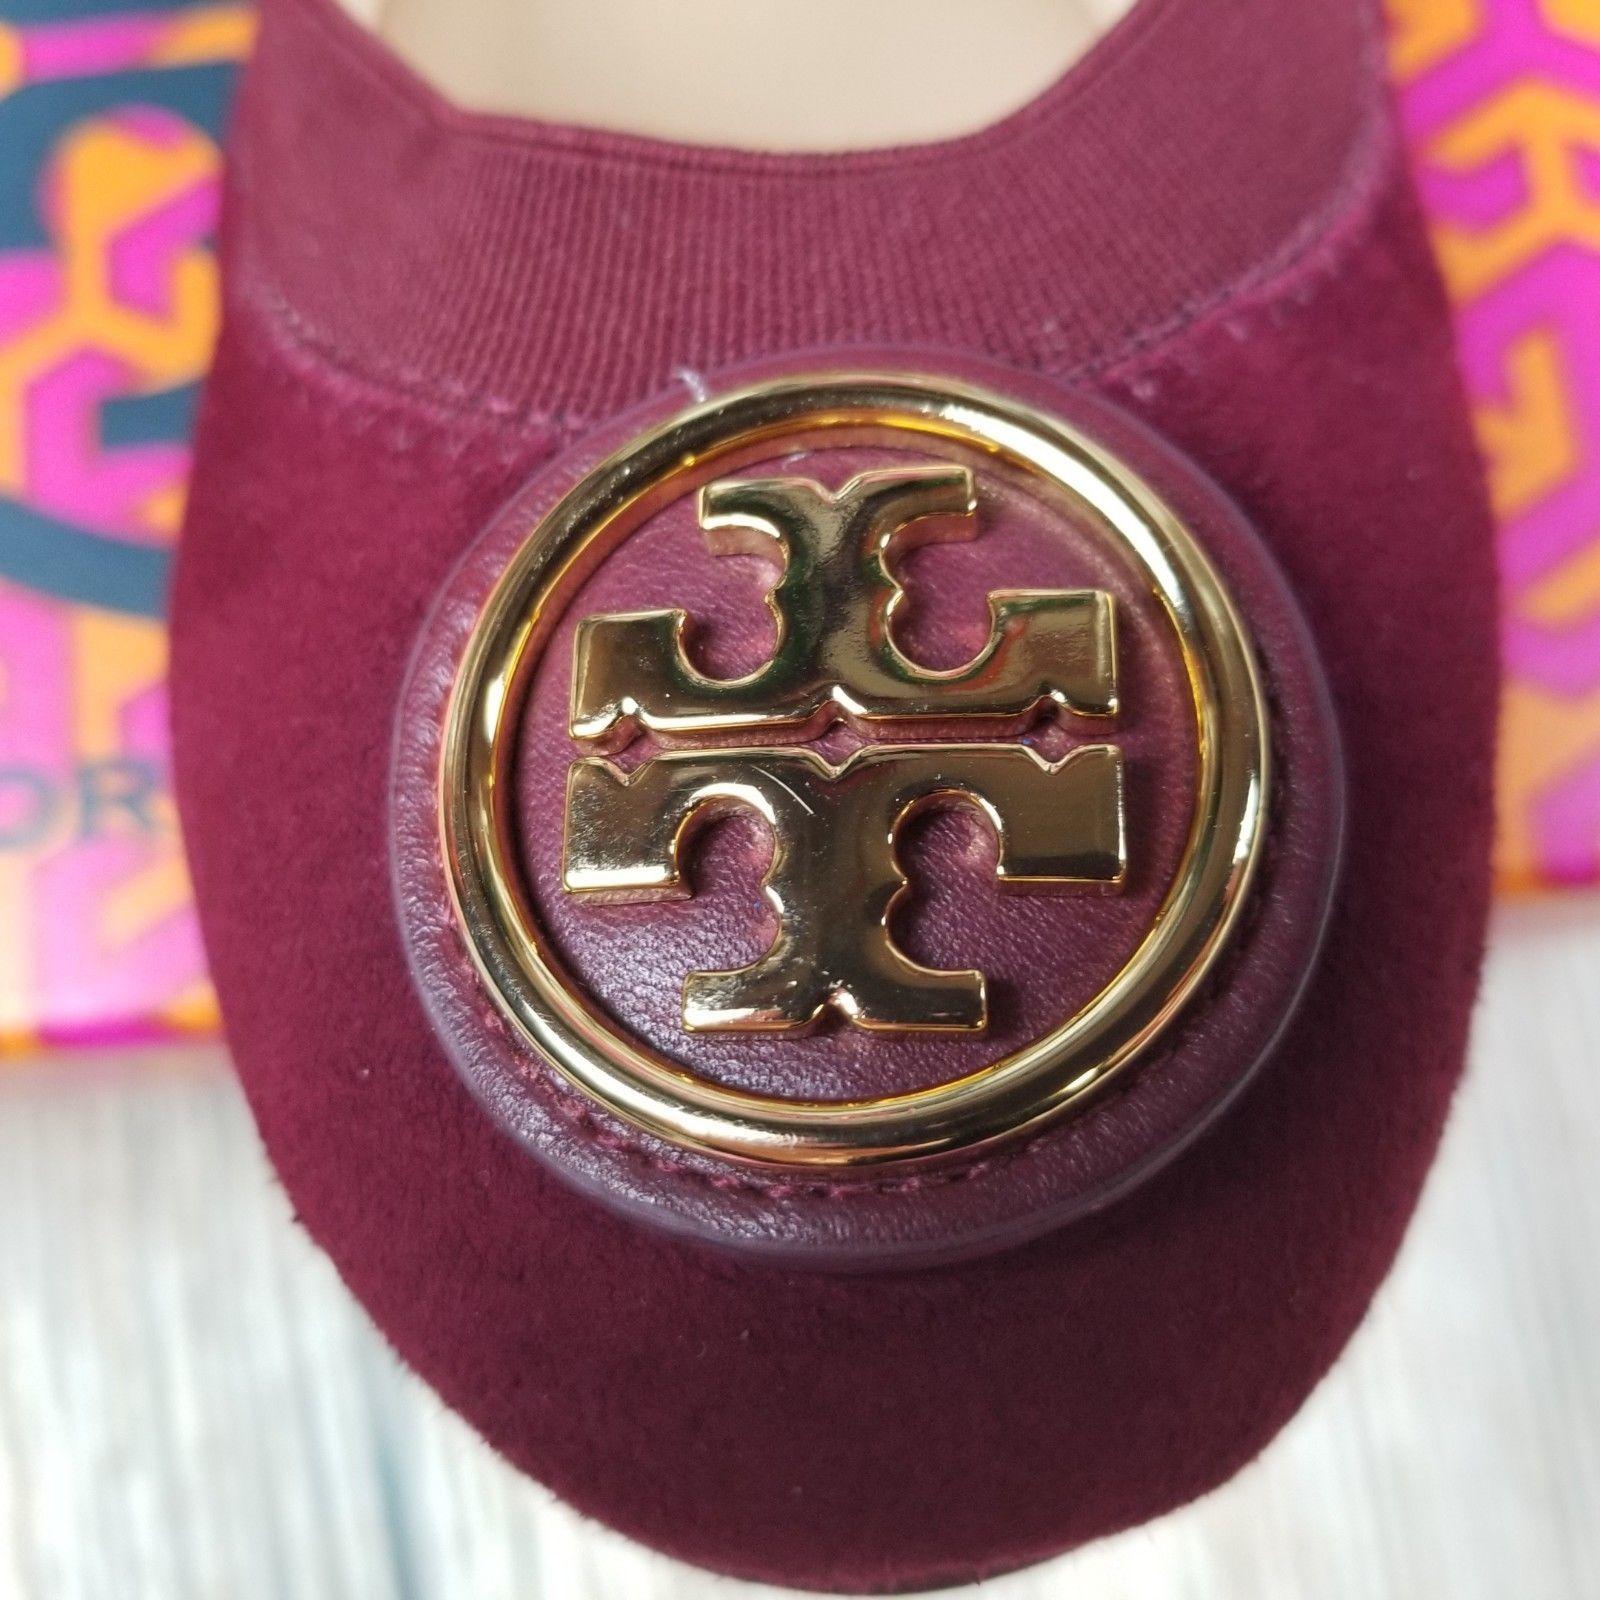 New TORY BURCH sz 6.5/7/7.5 dark red suede gold tone logo slip on flats $225